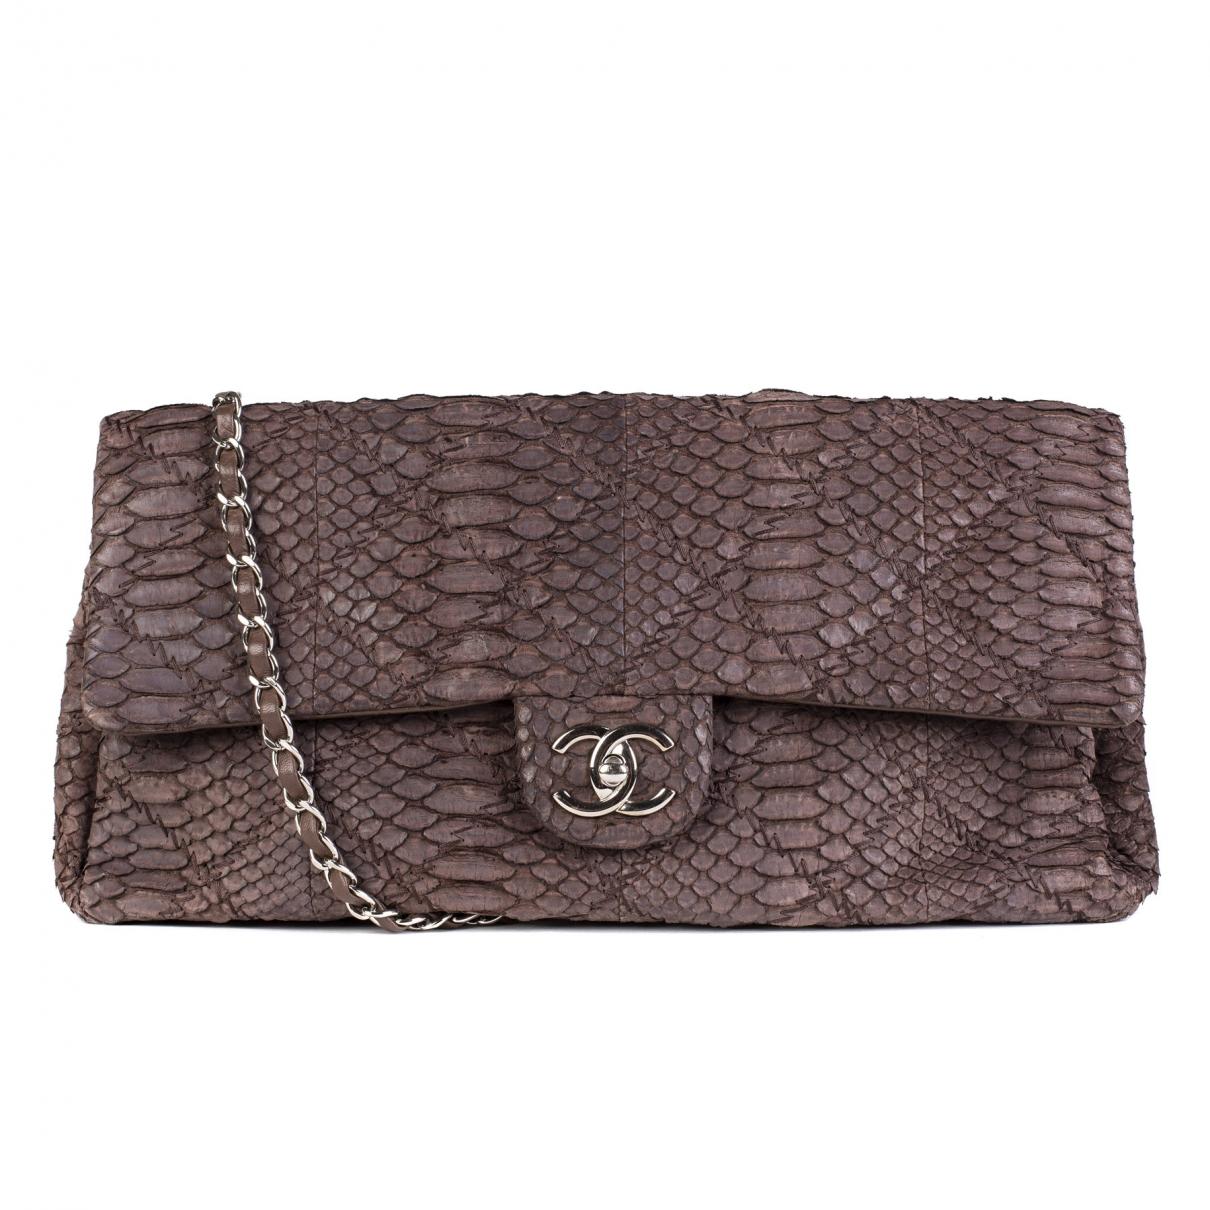 Chanel Timeless/Classique Brown Python handbag for Women \N